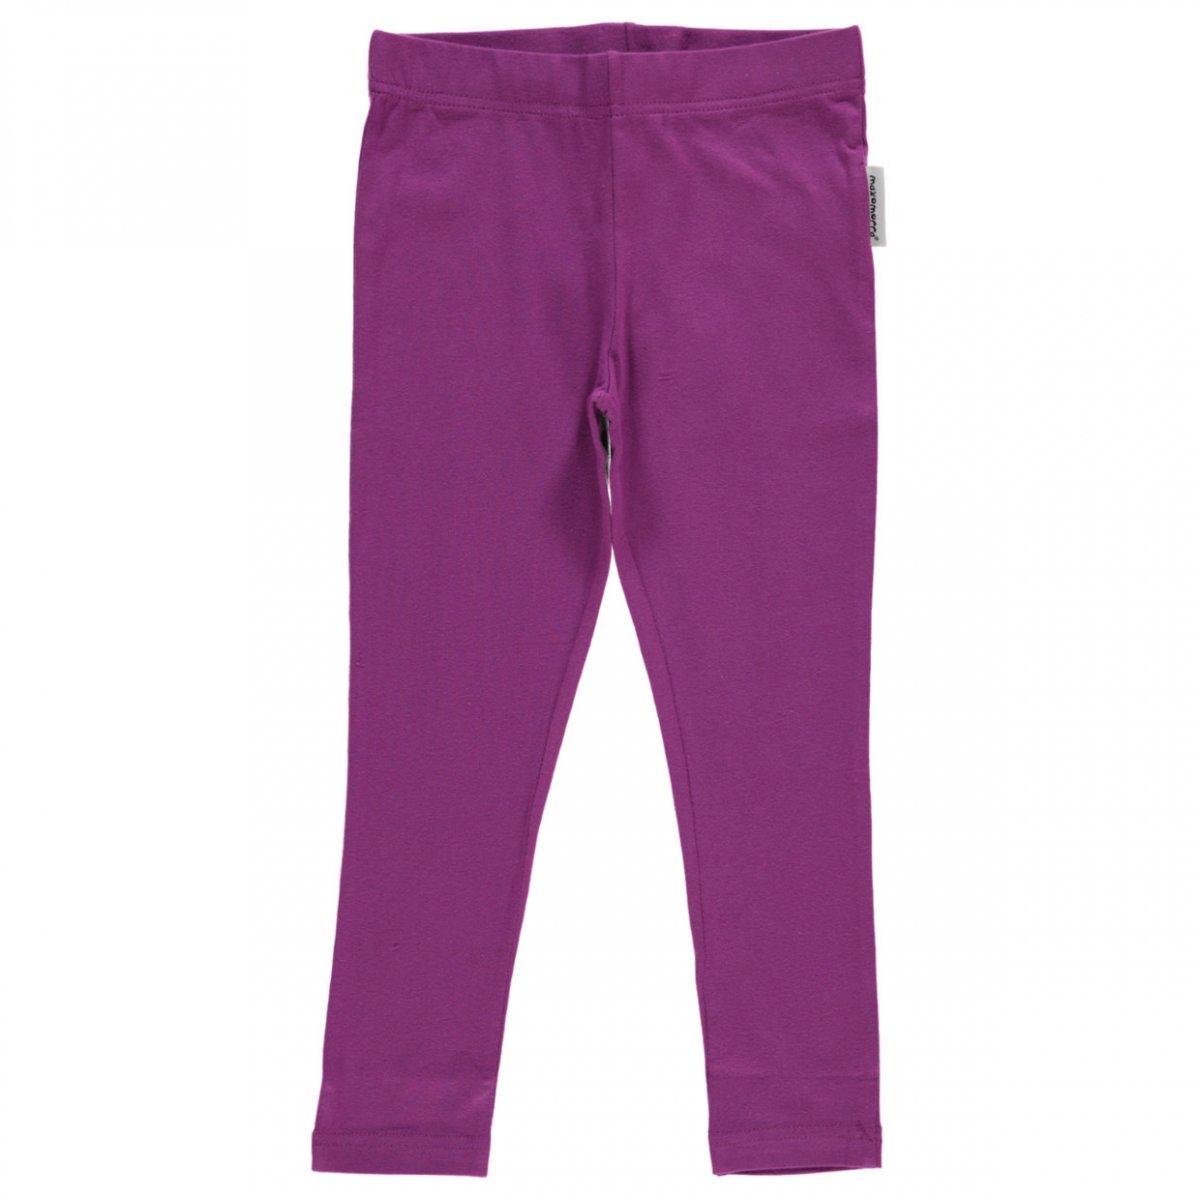 Leggings Purple in organic cotton